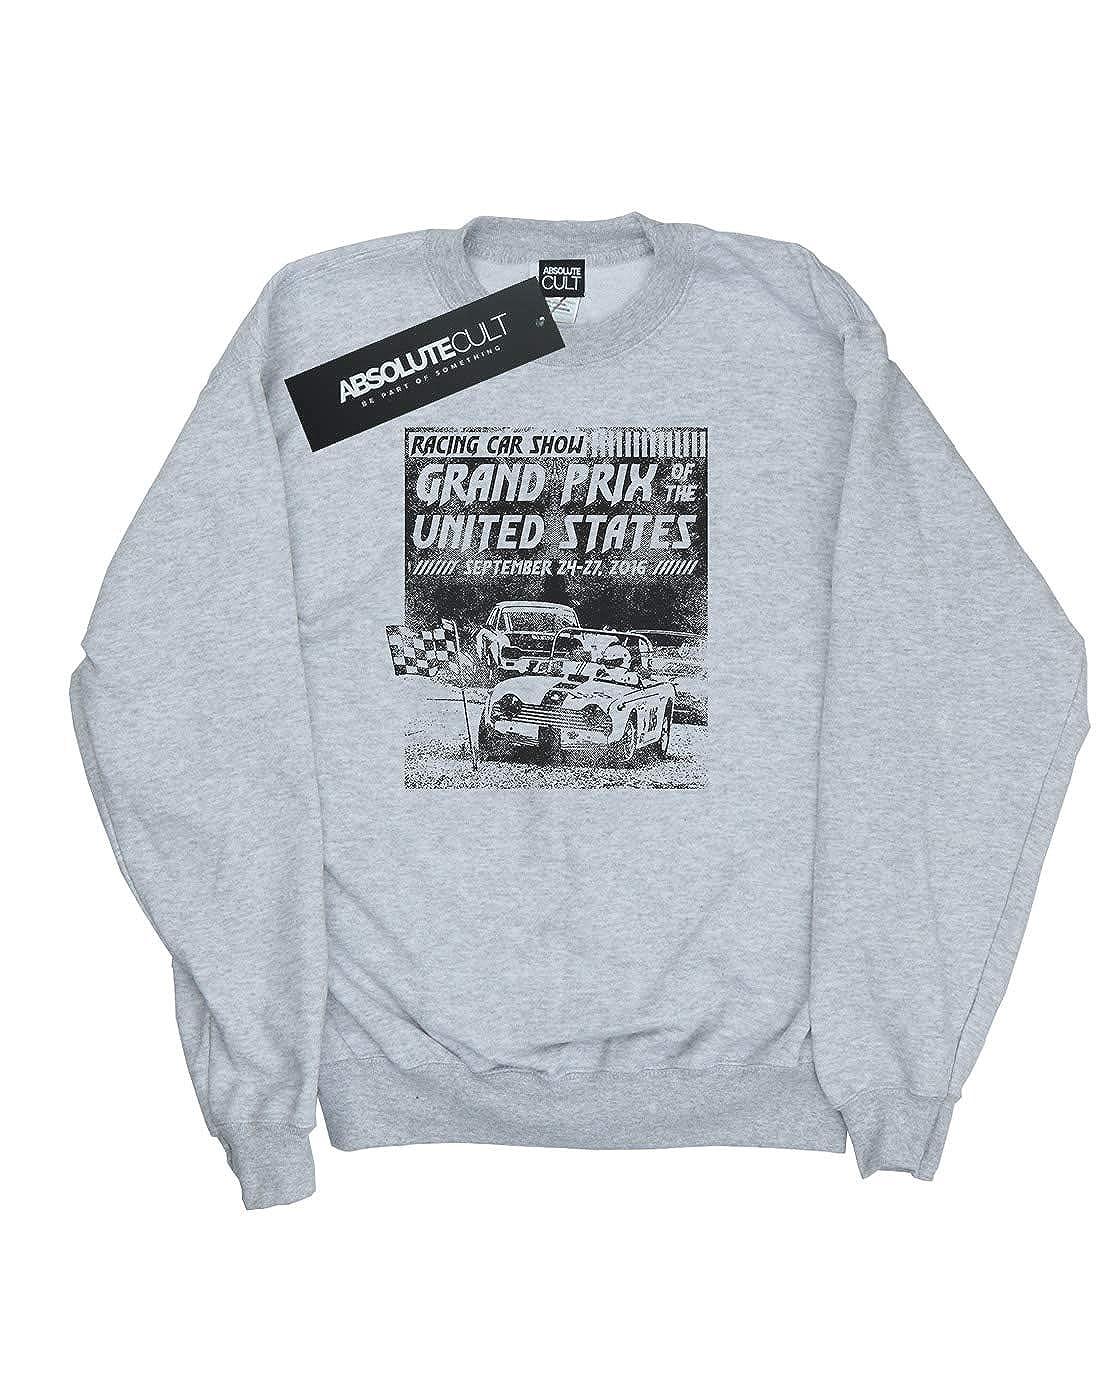 Absolute Cult Drewbacca Girls Grand Prix Sweatshirt